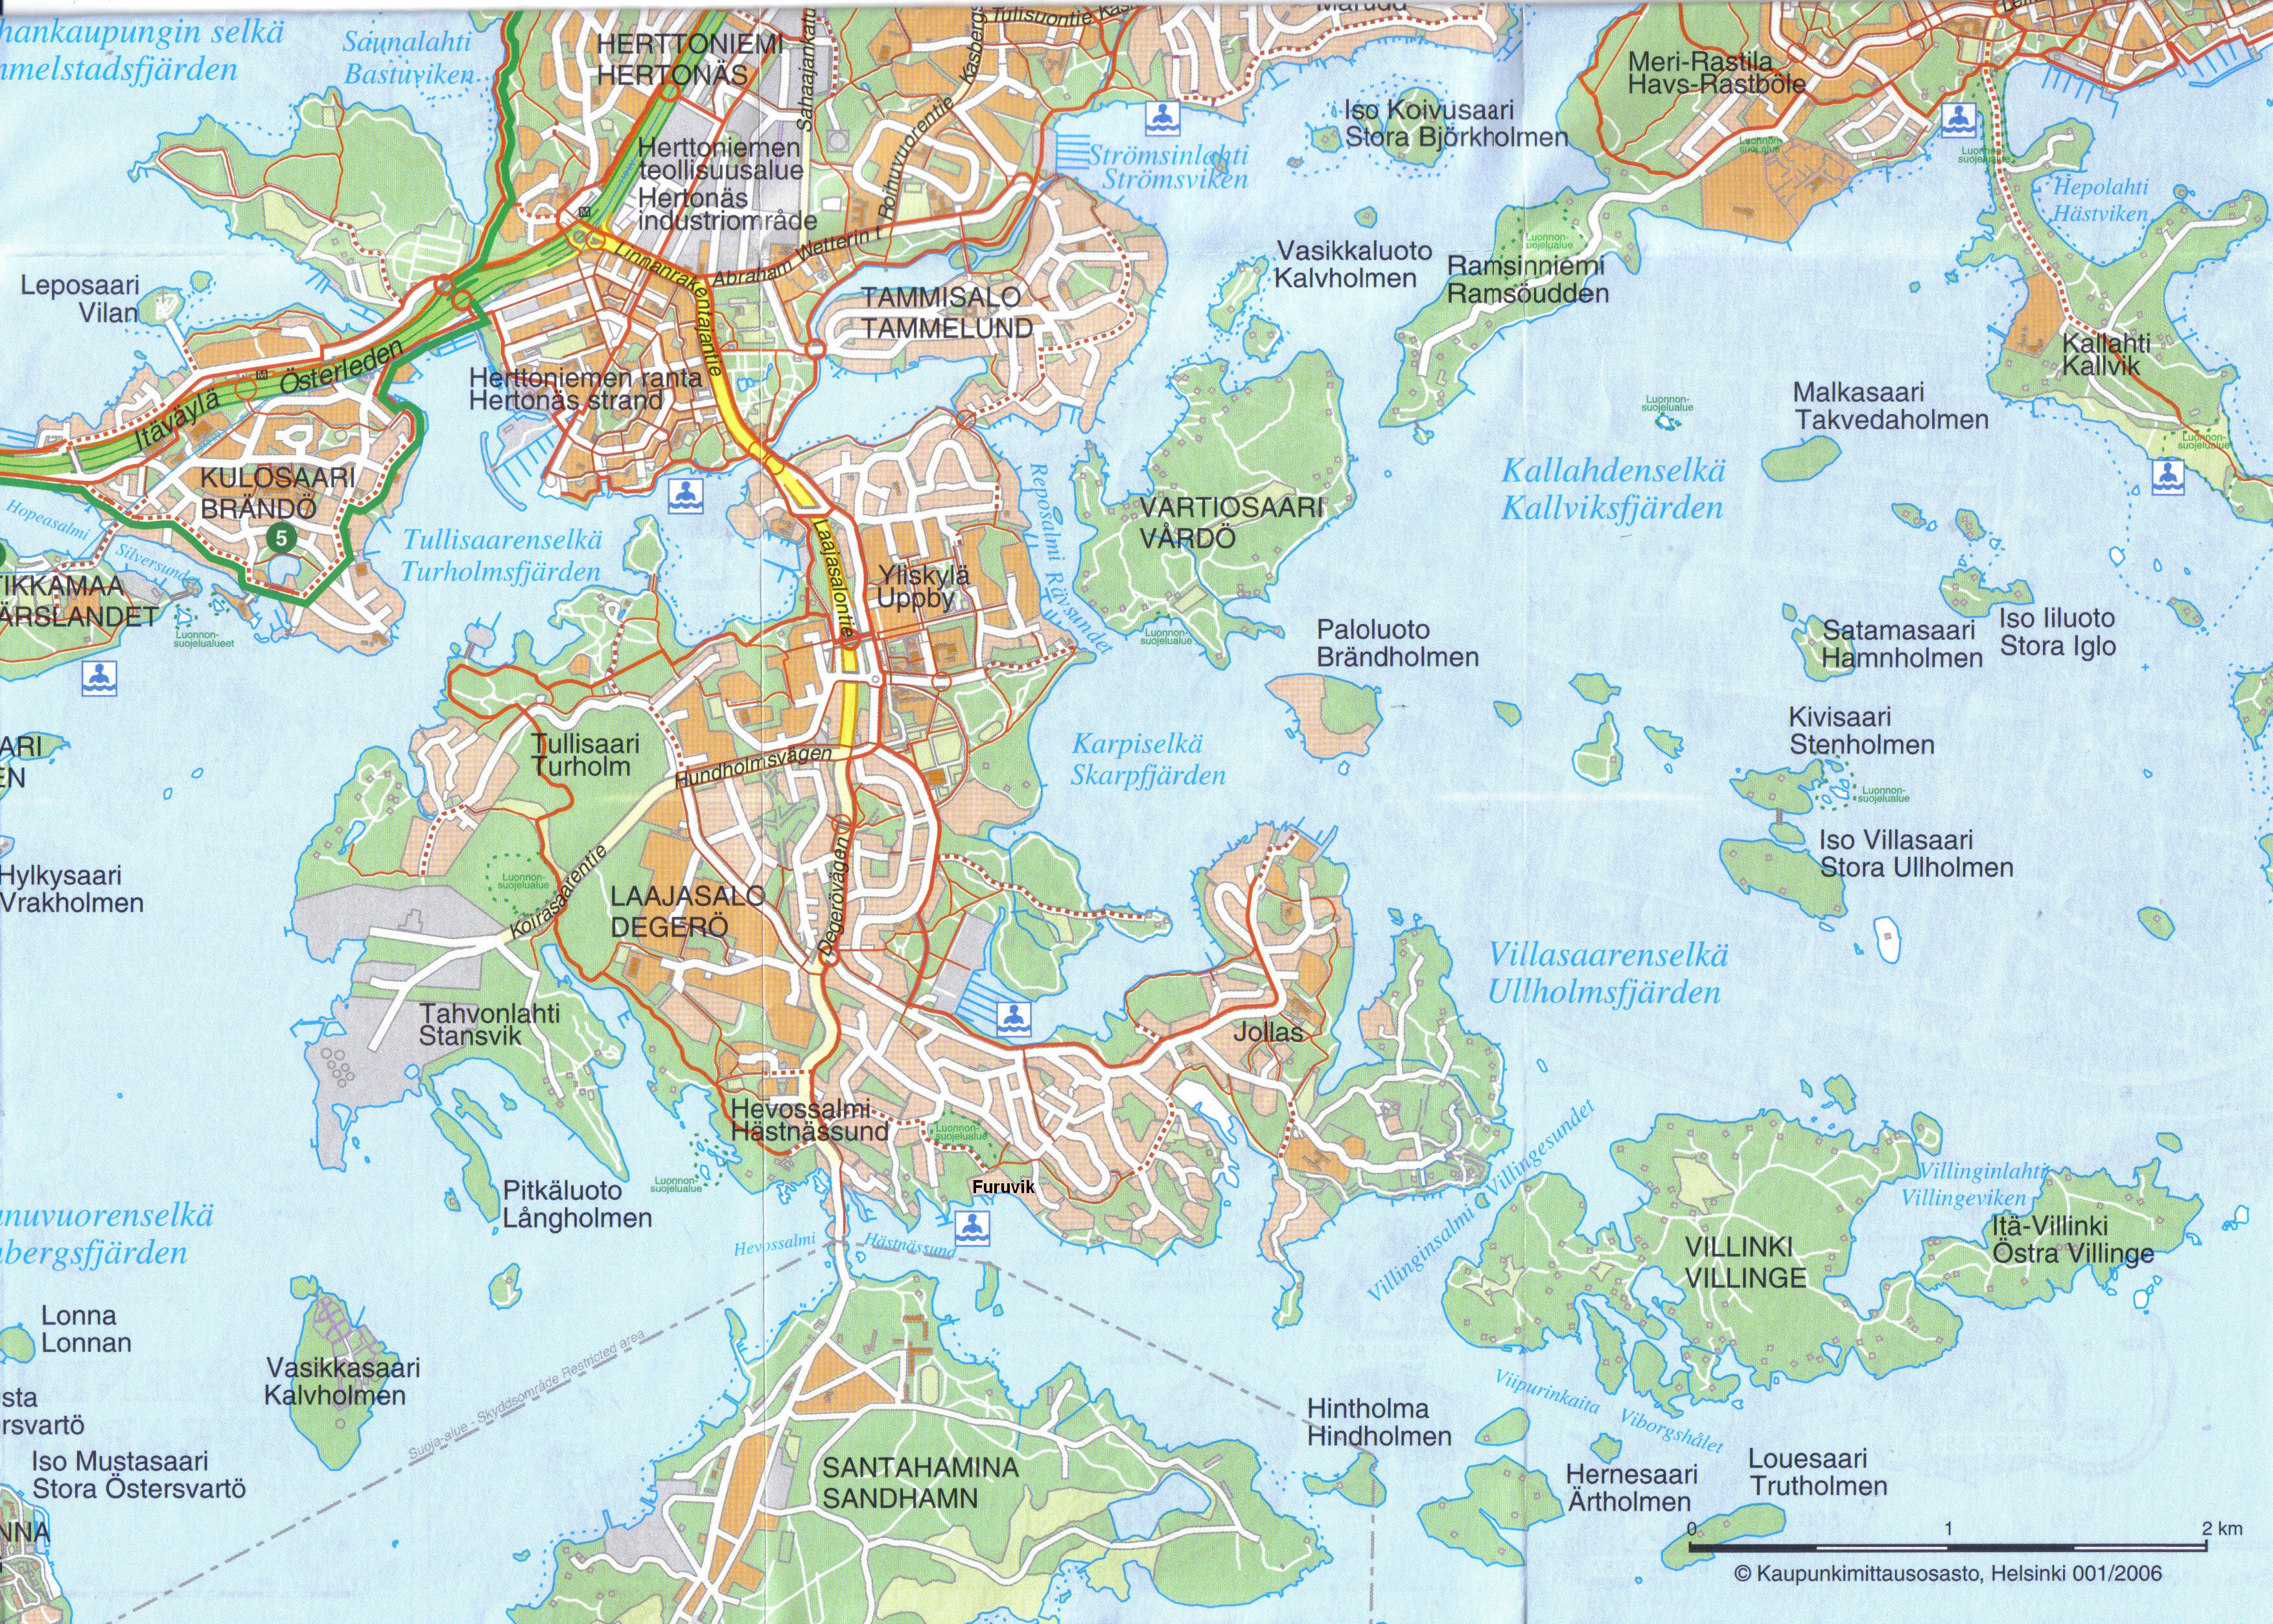 Laajasalon Kartta Iso Helsinki Tallinna Seura R Y Hetas